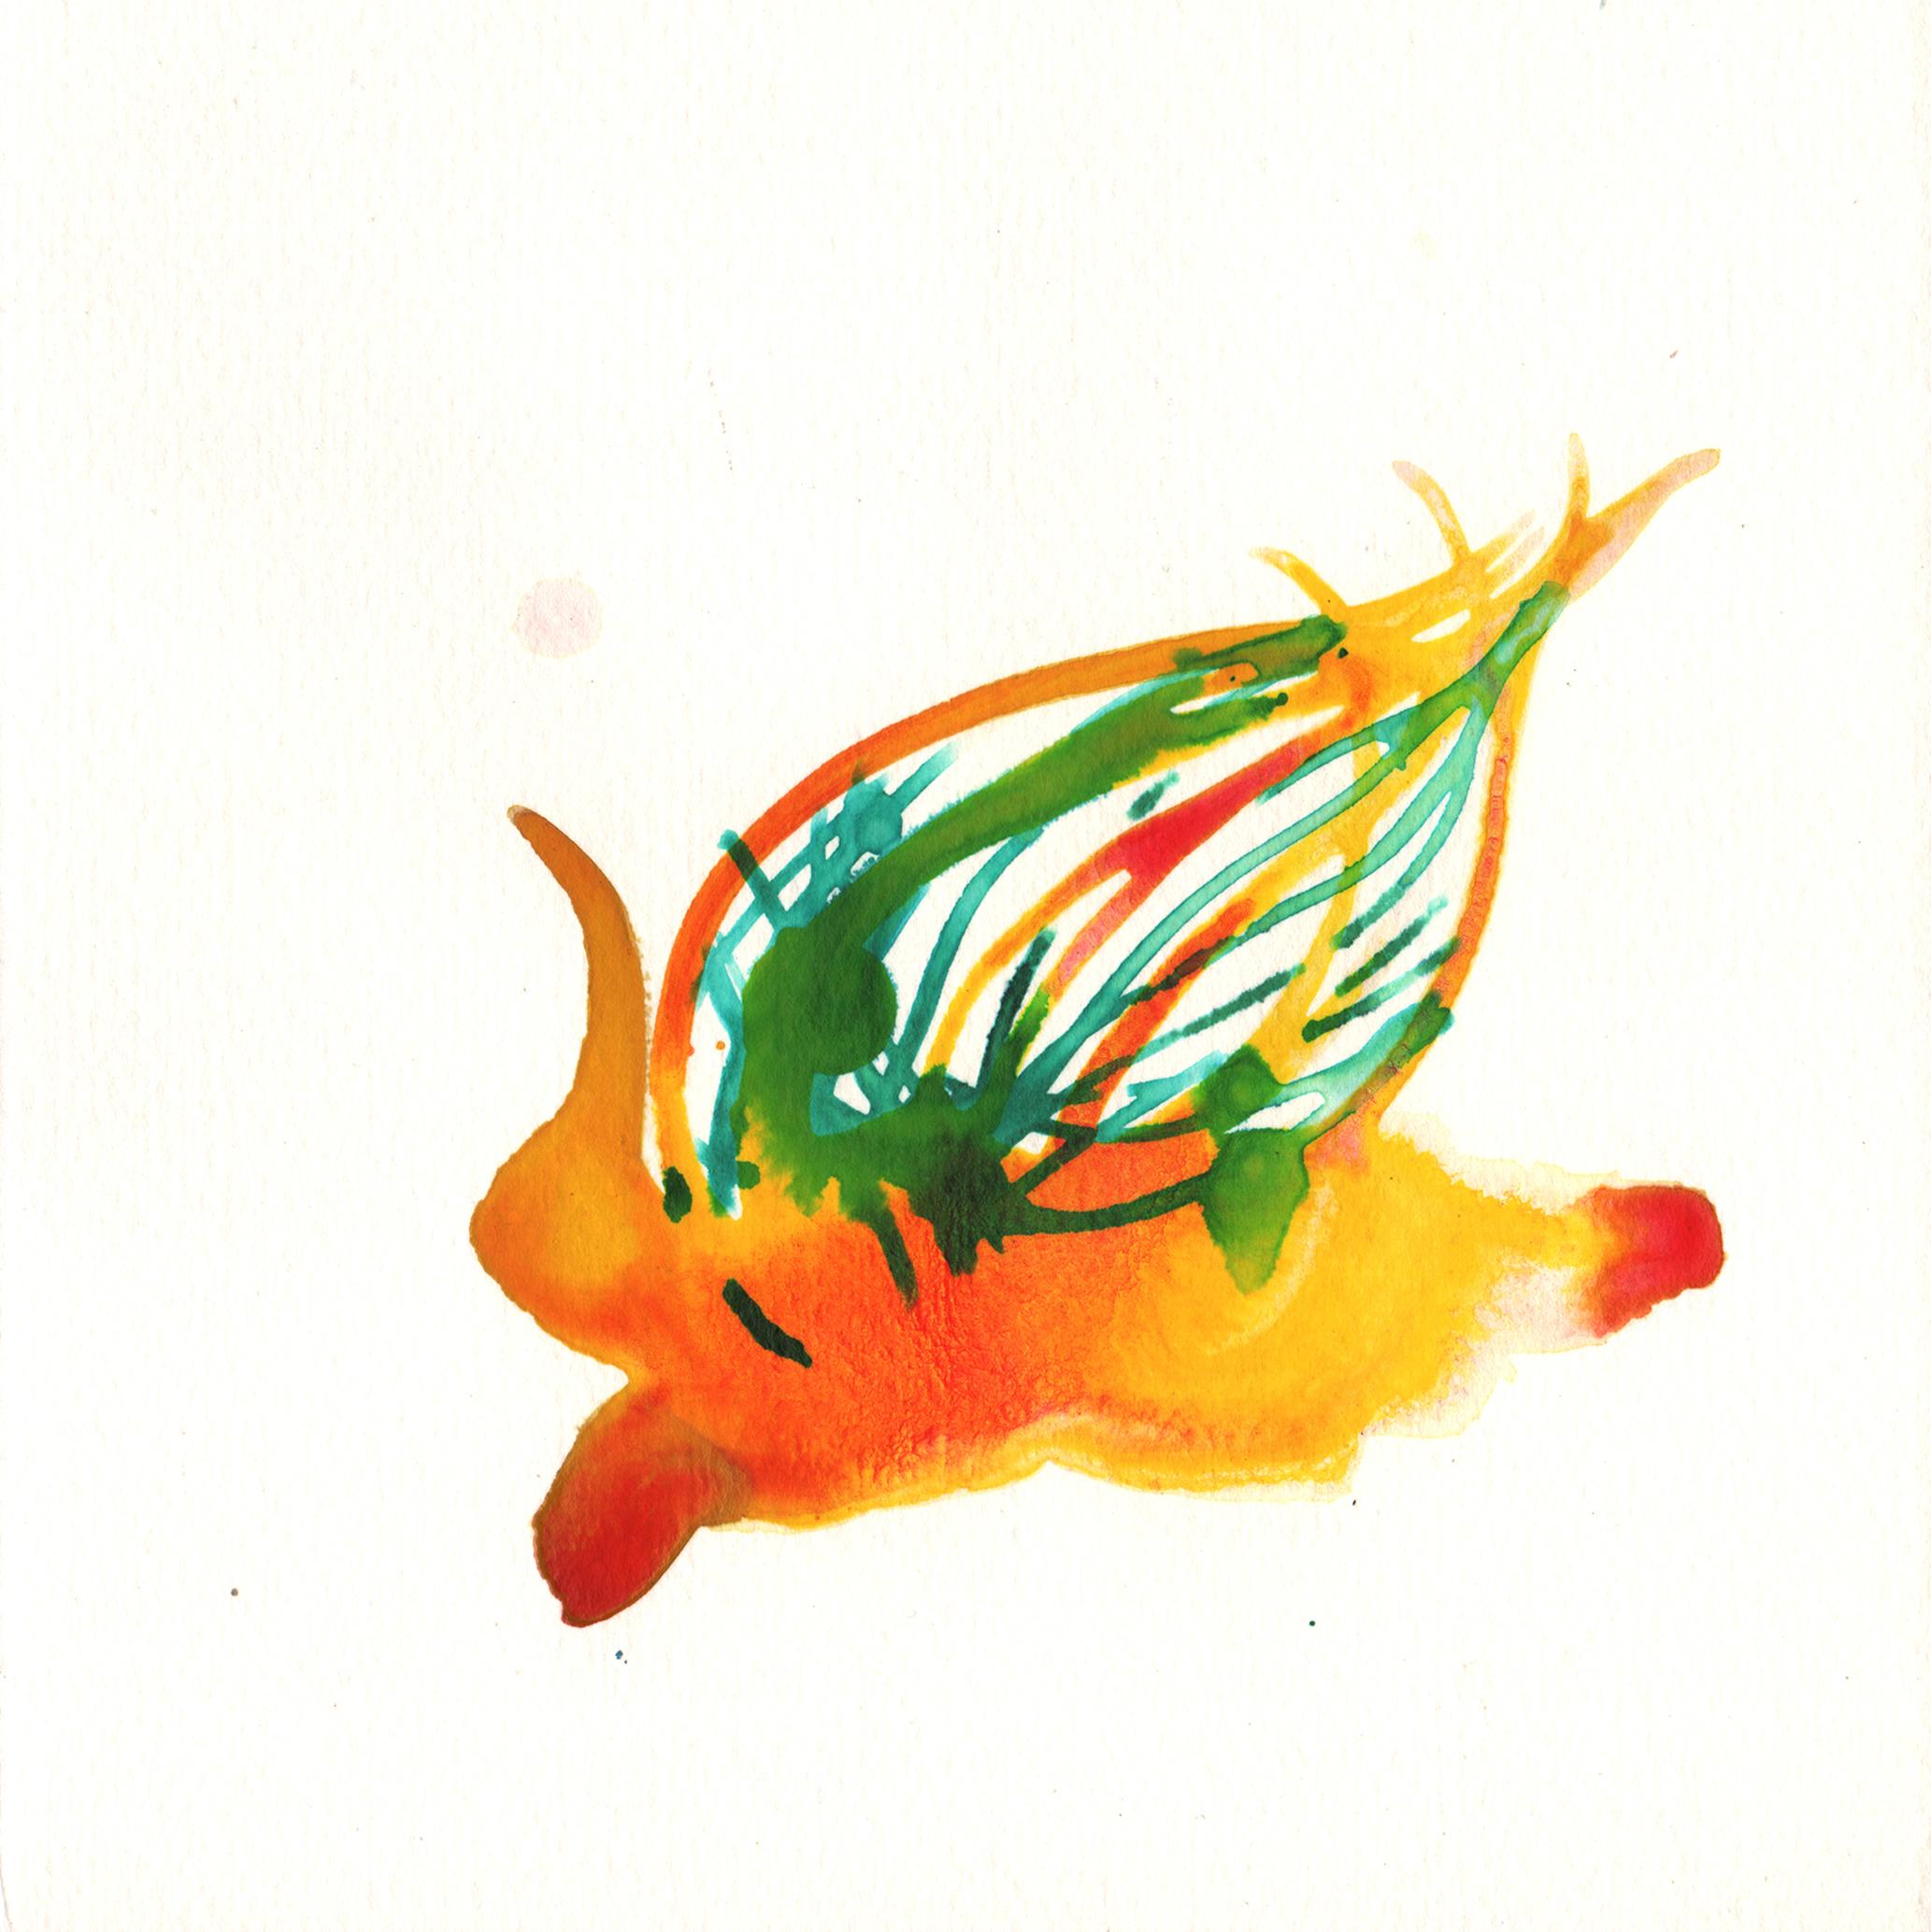 253.Protea.10.19.14.jpg